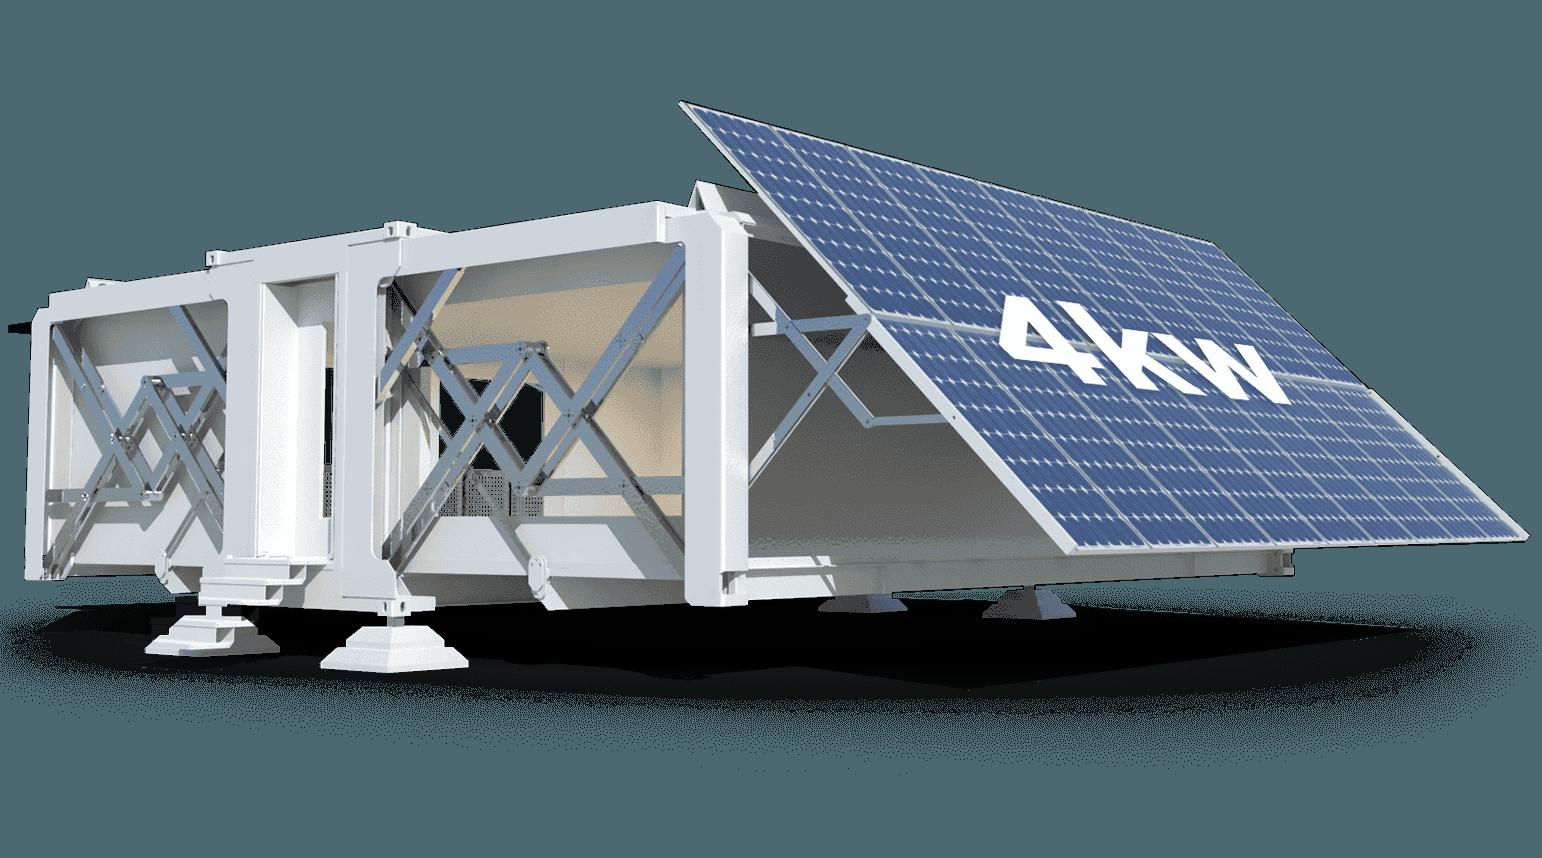 ten-fold-engineering-tf-64-maisons-pliables-transportables-par-camion-1